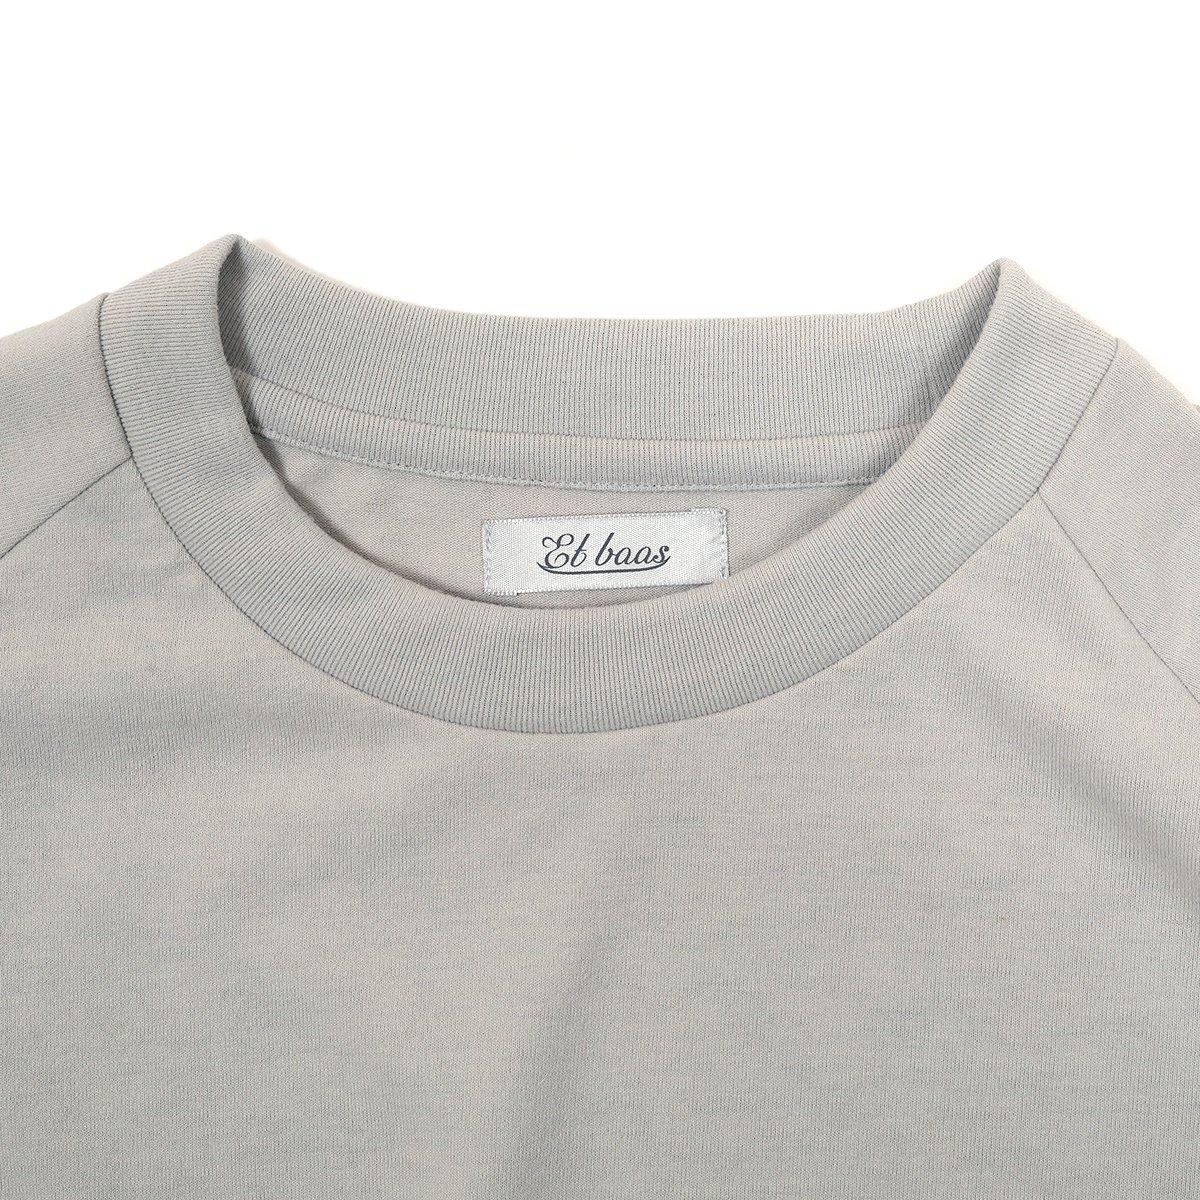 Short Sleeve RIB T-shirts 詳細画像19